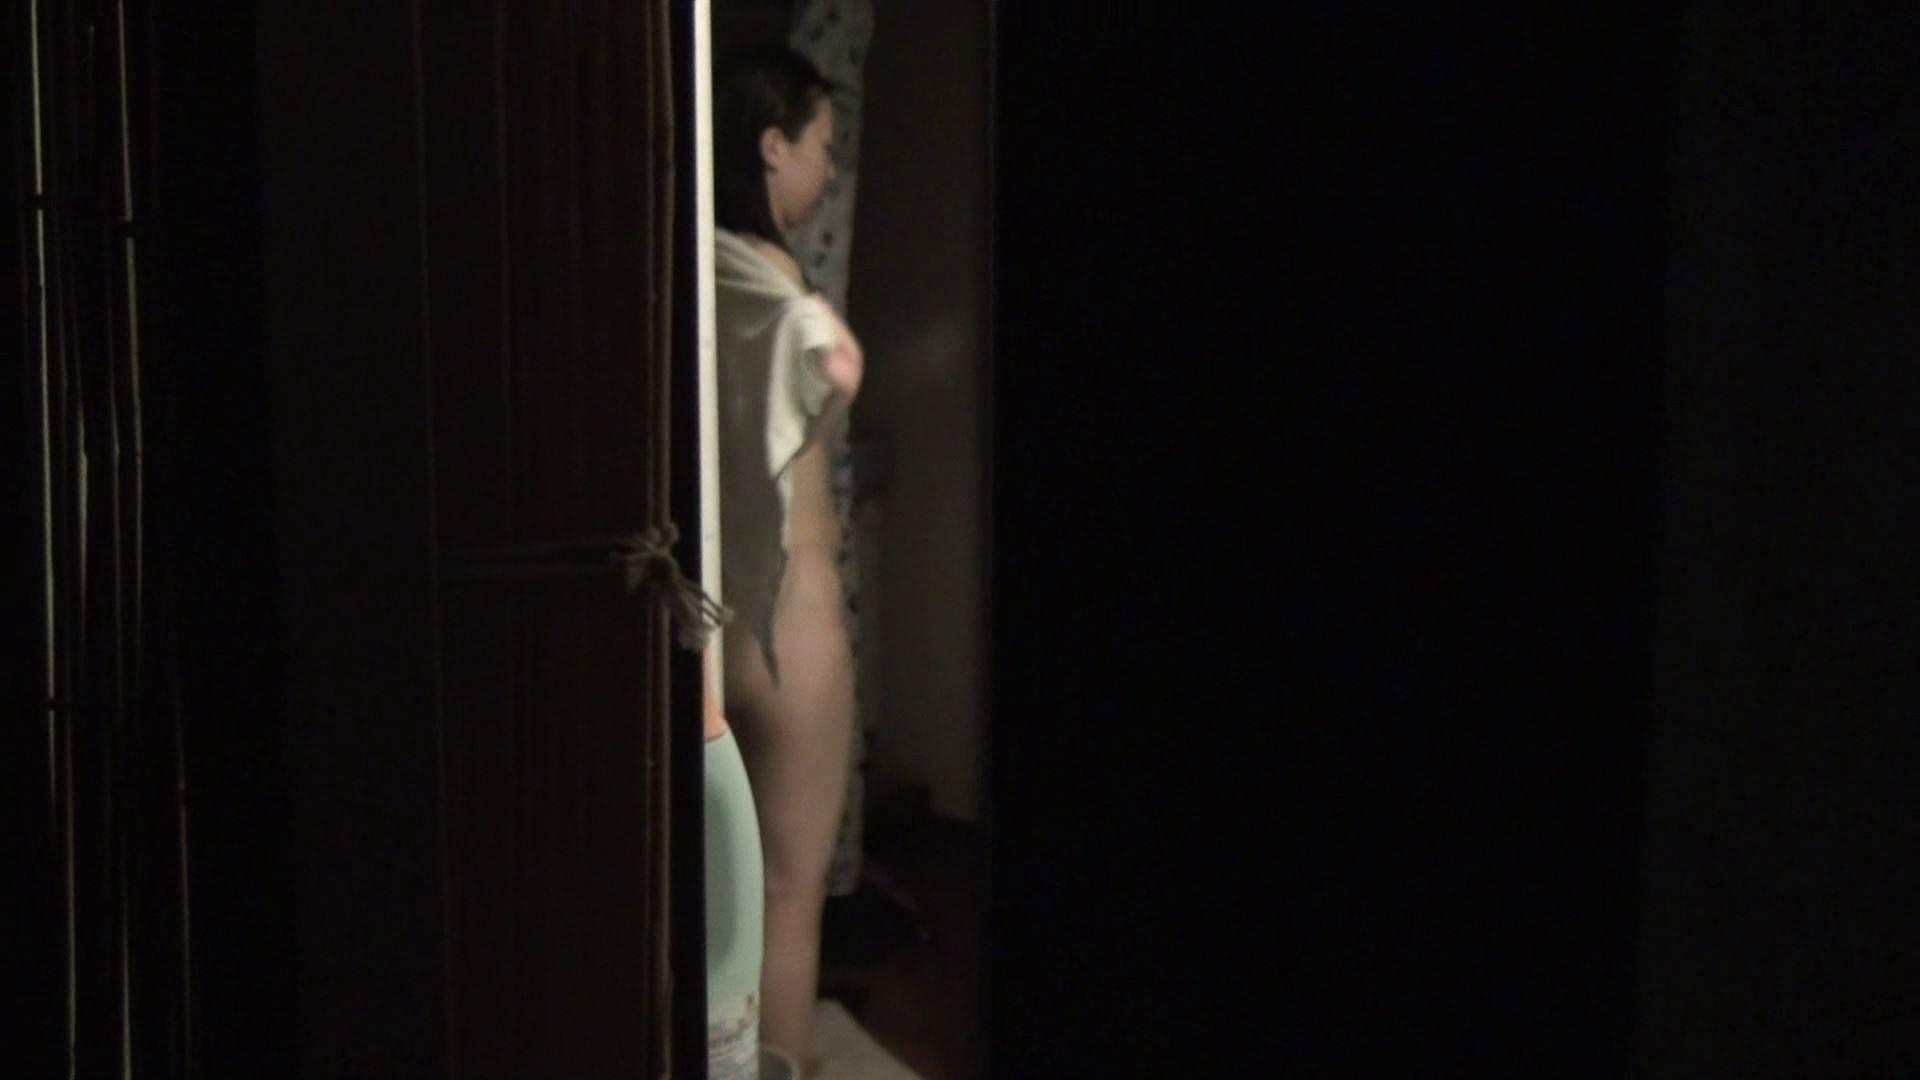 vol.06顔を洗い流す極上お女市さんの裸体をハイビジョンで!風呂上り着替え必見! 民家 オメコ動画キャプチャ 84pic 39